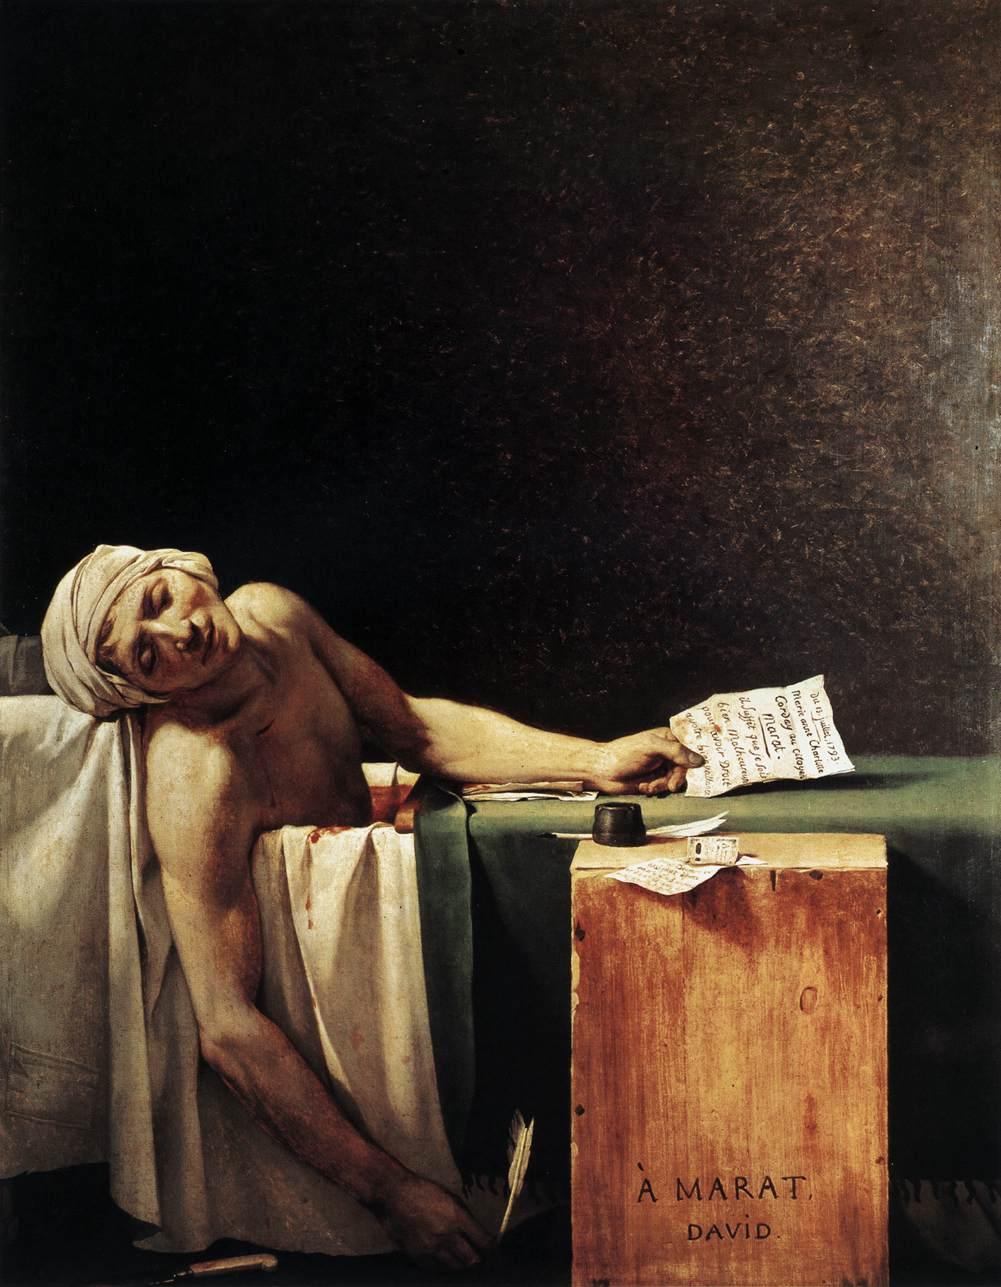 David Marat assassine 1793 Musee Royal Beaux Arts Bruxelles 165 x 128